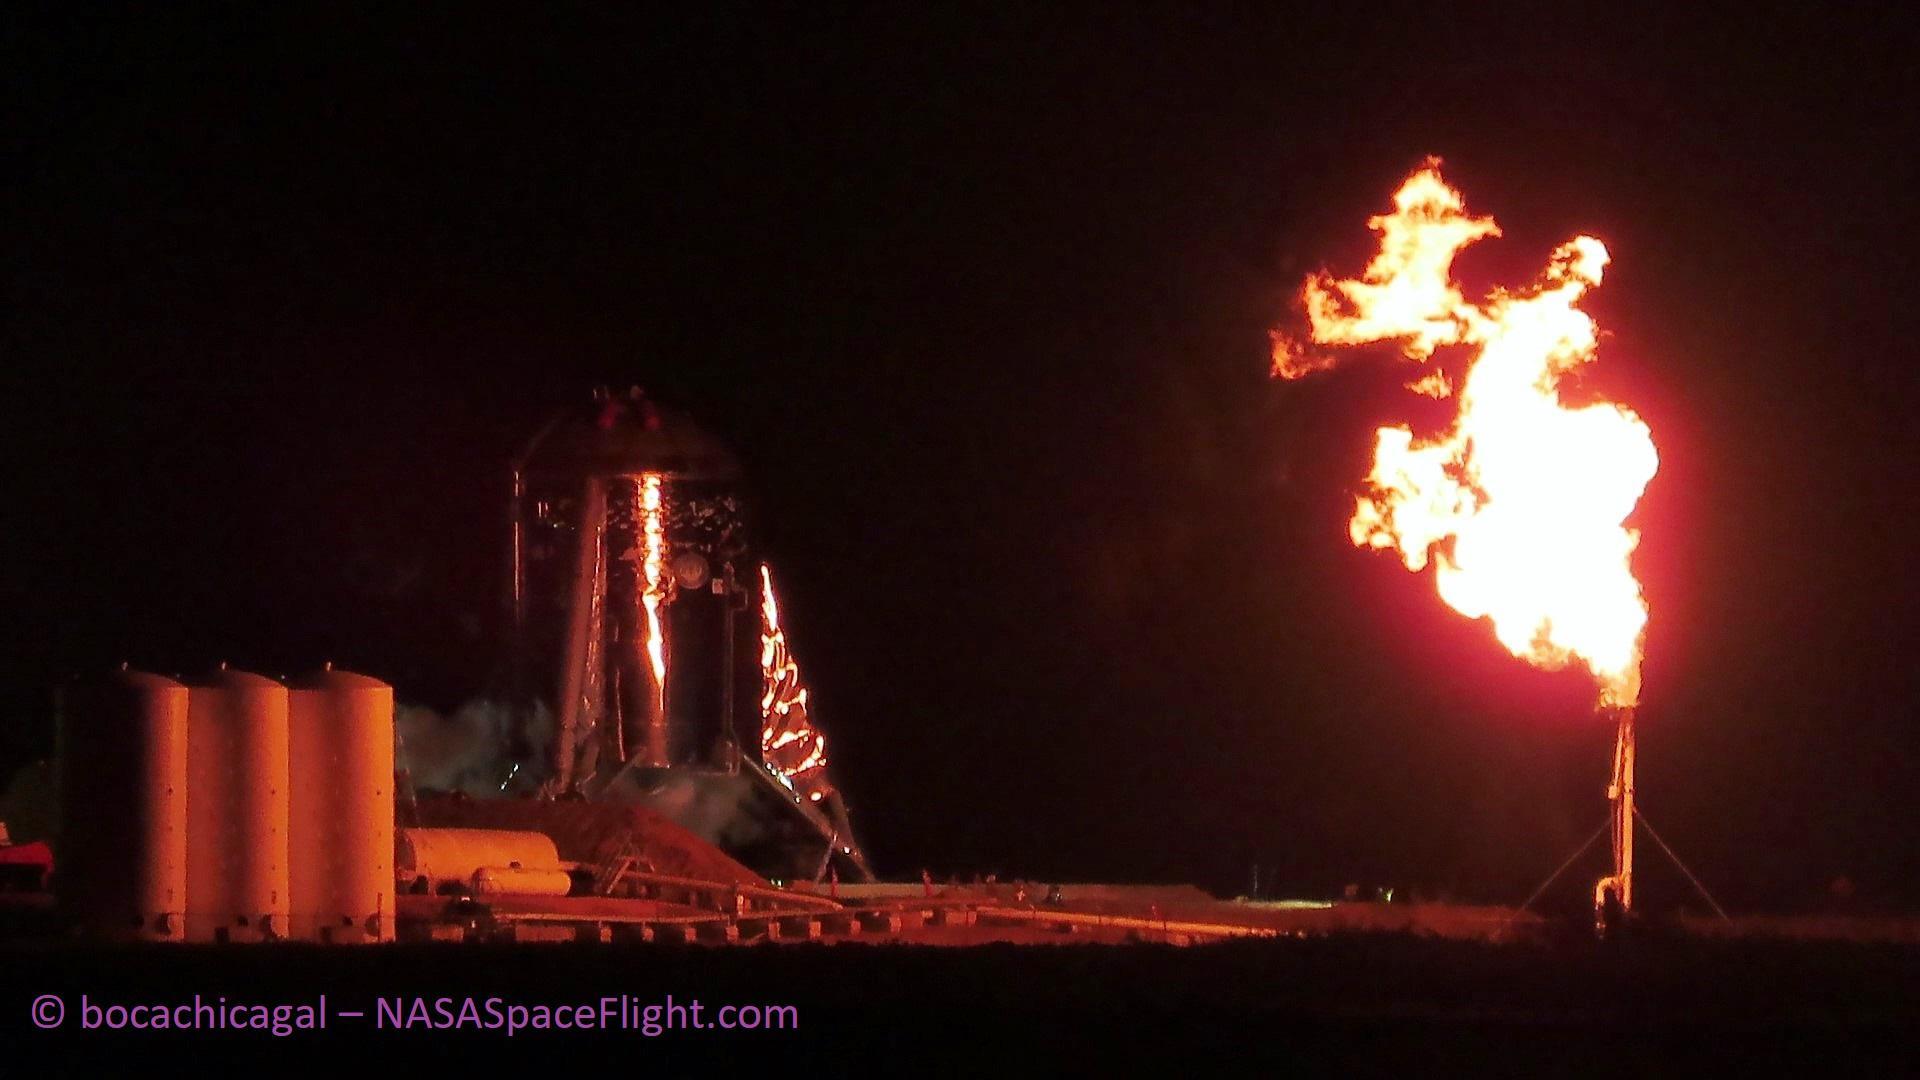 Boca Chica Starhopper testing 040219 (NASASpaceflight – bocachicagal) 1 (c)